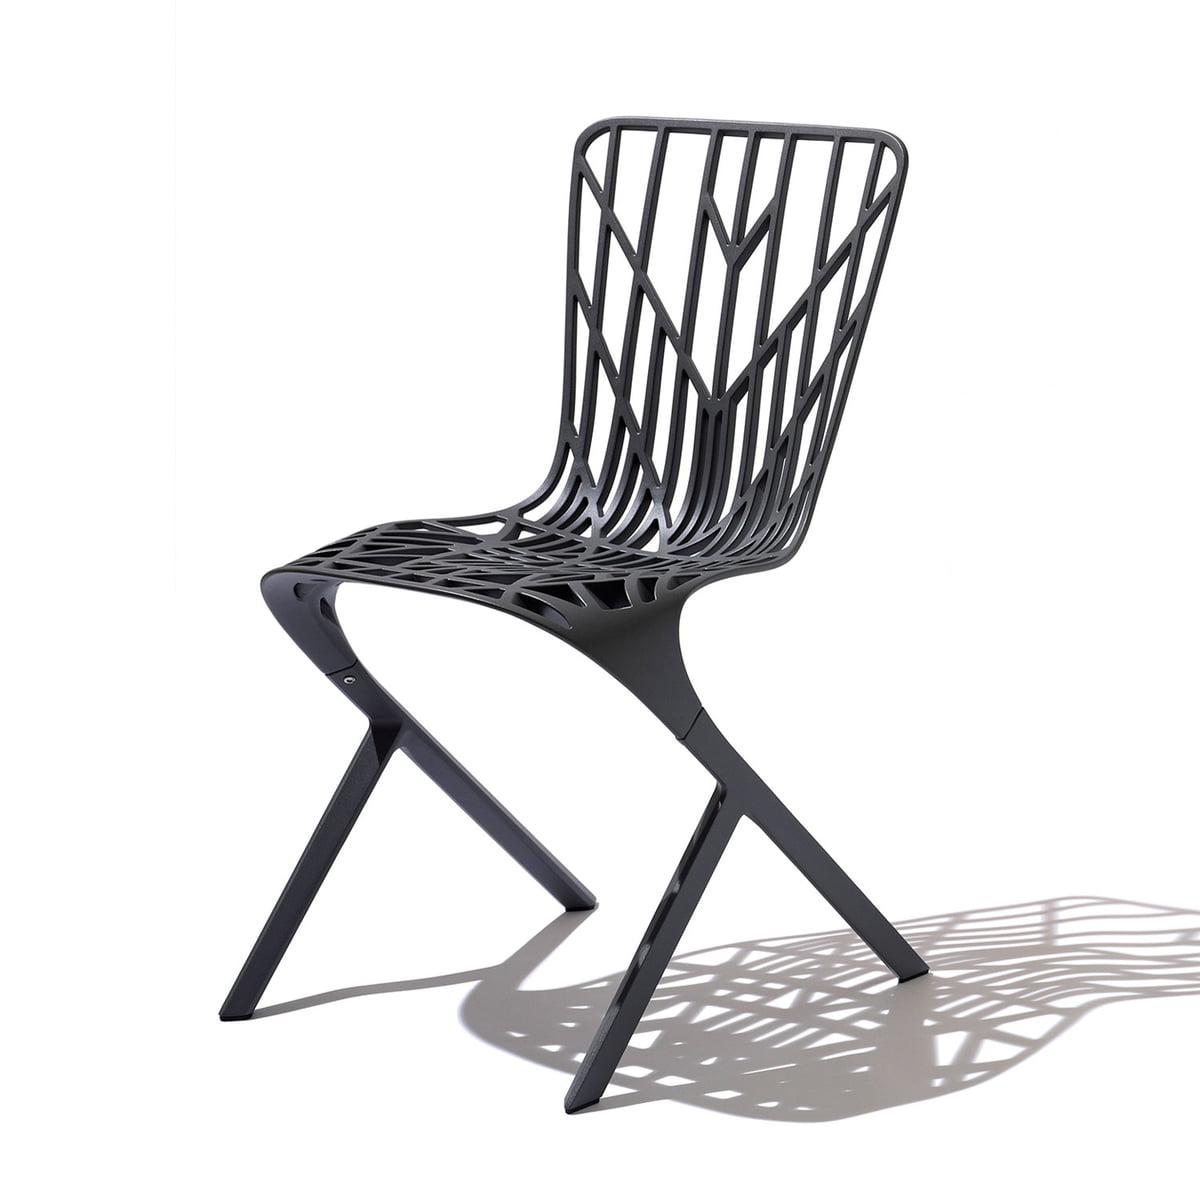 Charmant Knoll   Washington Skeleton Chair, Aluminium Black